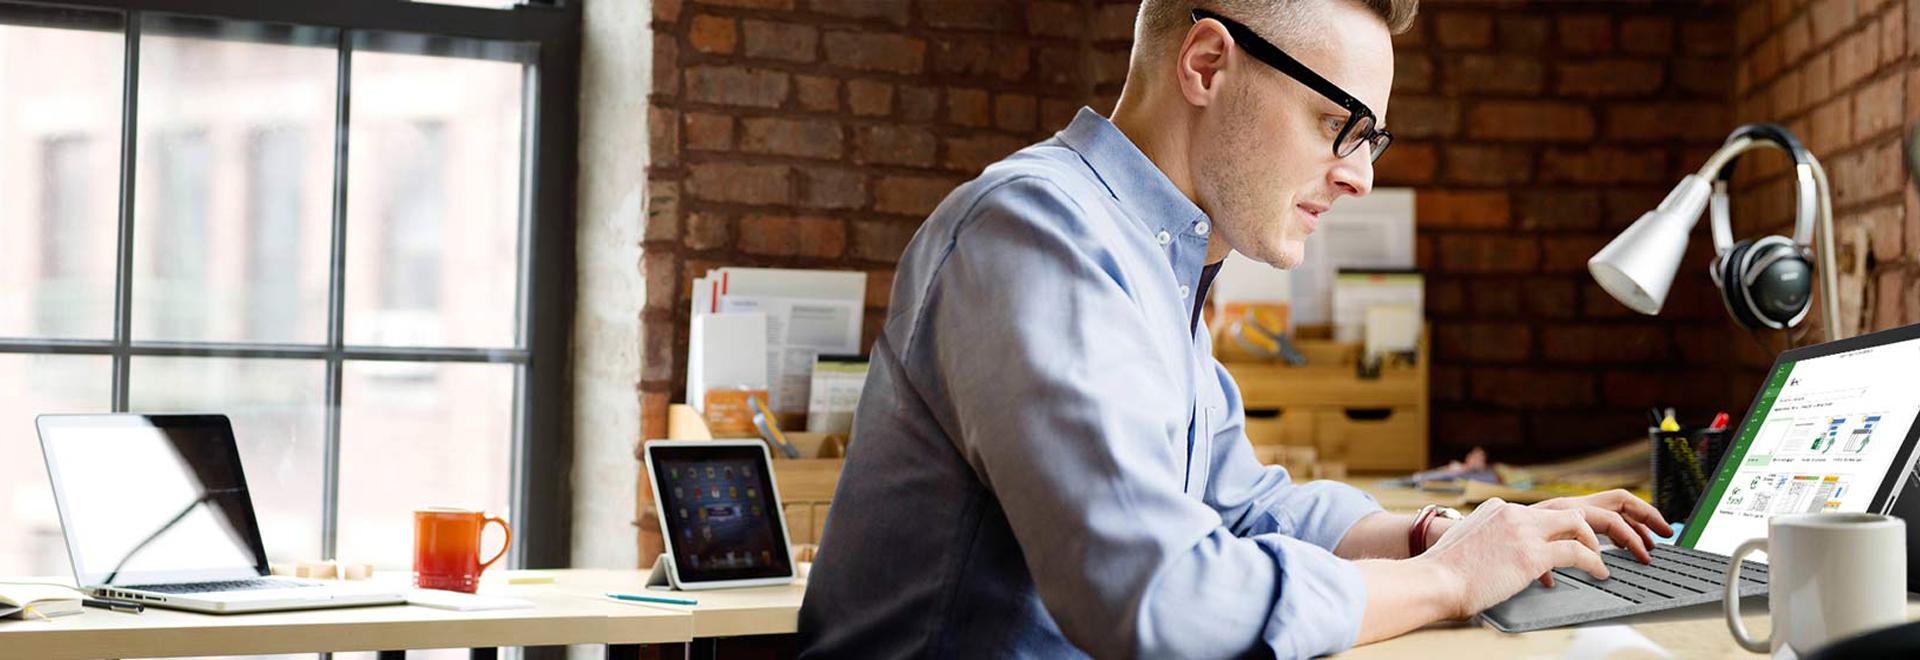 Čovek sedi za radnim stolom i radi na Surface tabletu pomoću programa Microsoft Project.